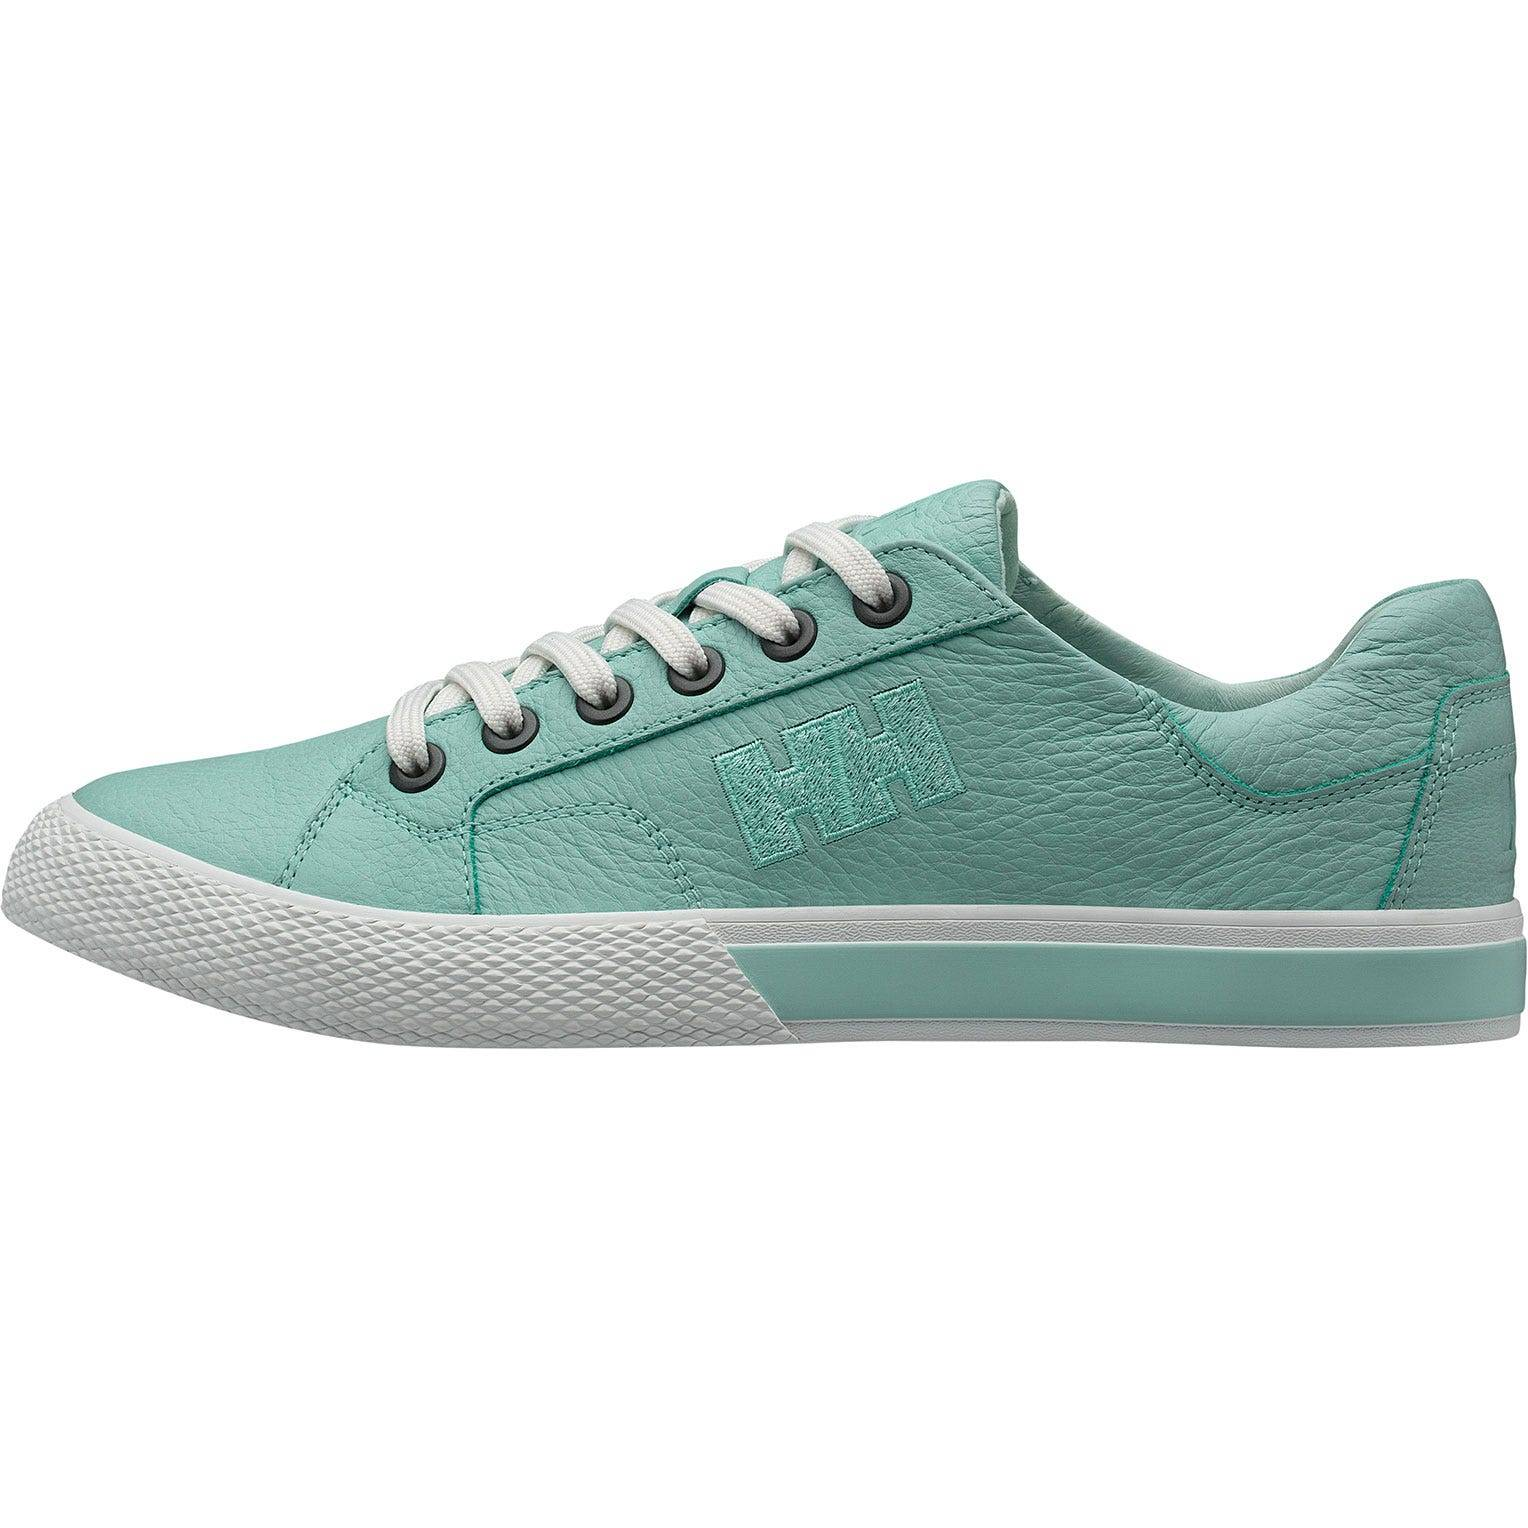 Helly Hansen W Fjord Lv2 Womens Casual Shoe Blue 38.7/7.5